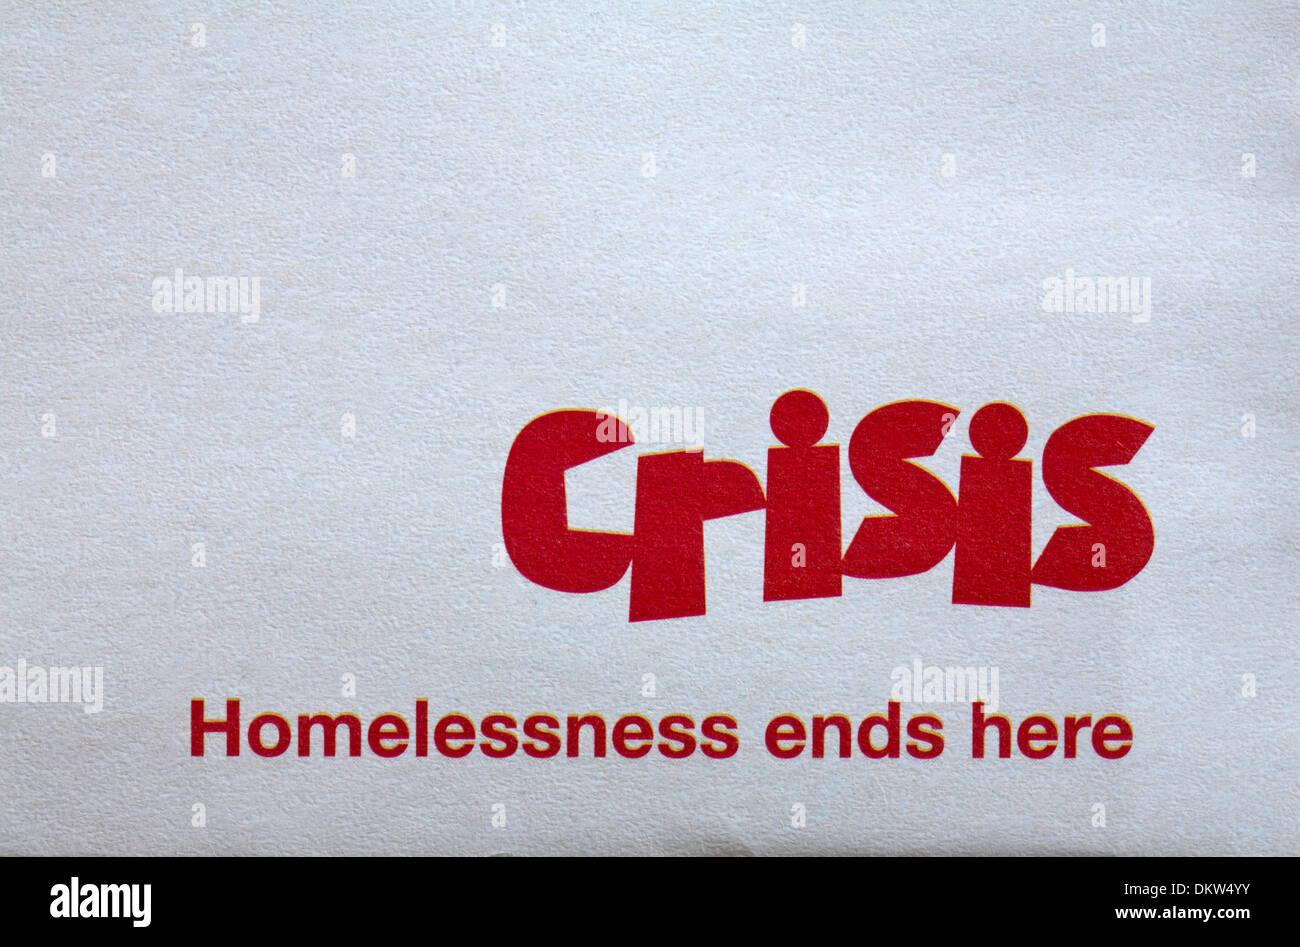 Crisis Homelessness ends here logo on envelope - Stock Image